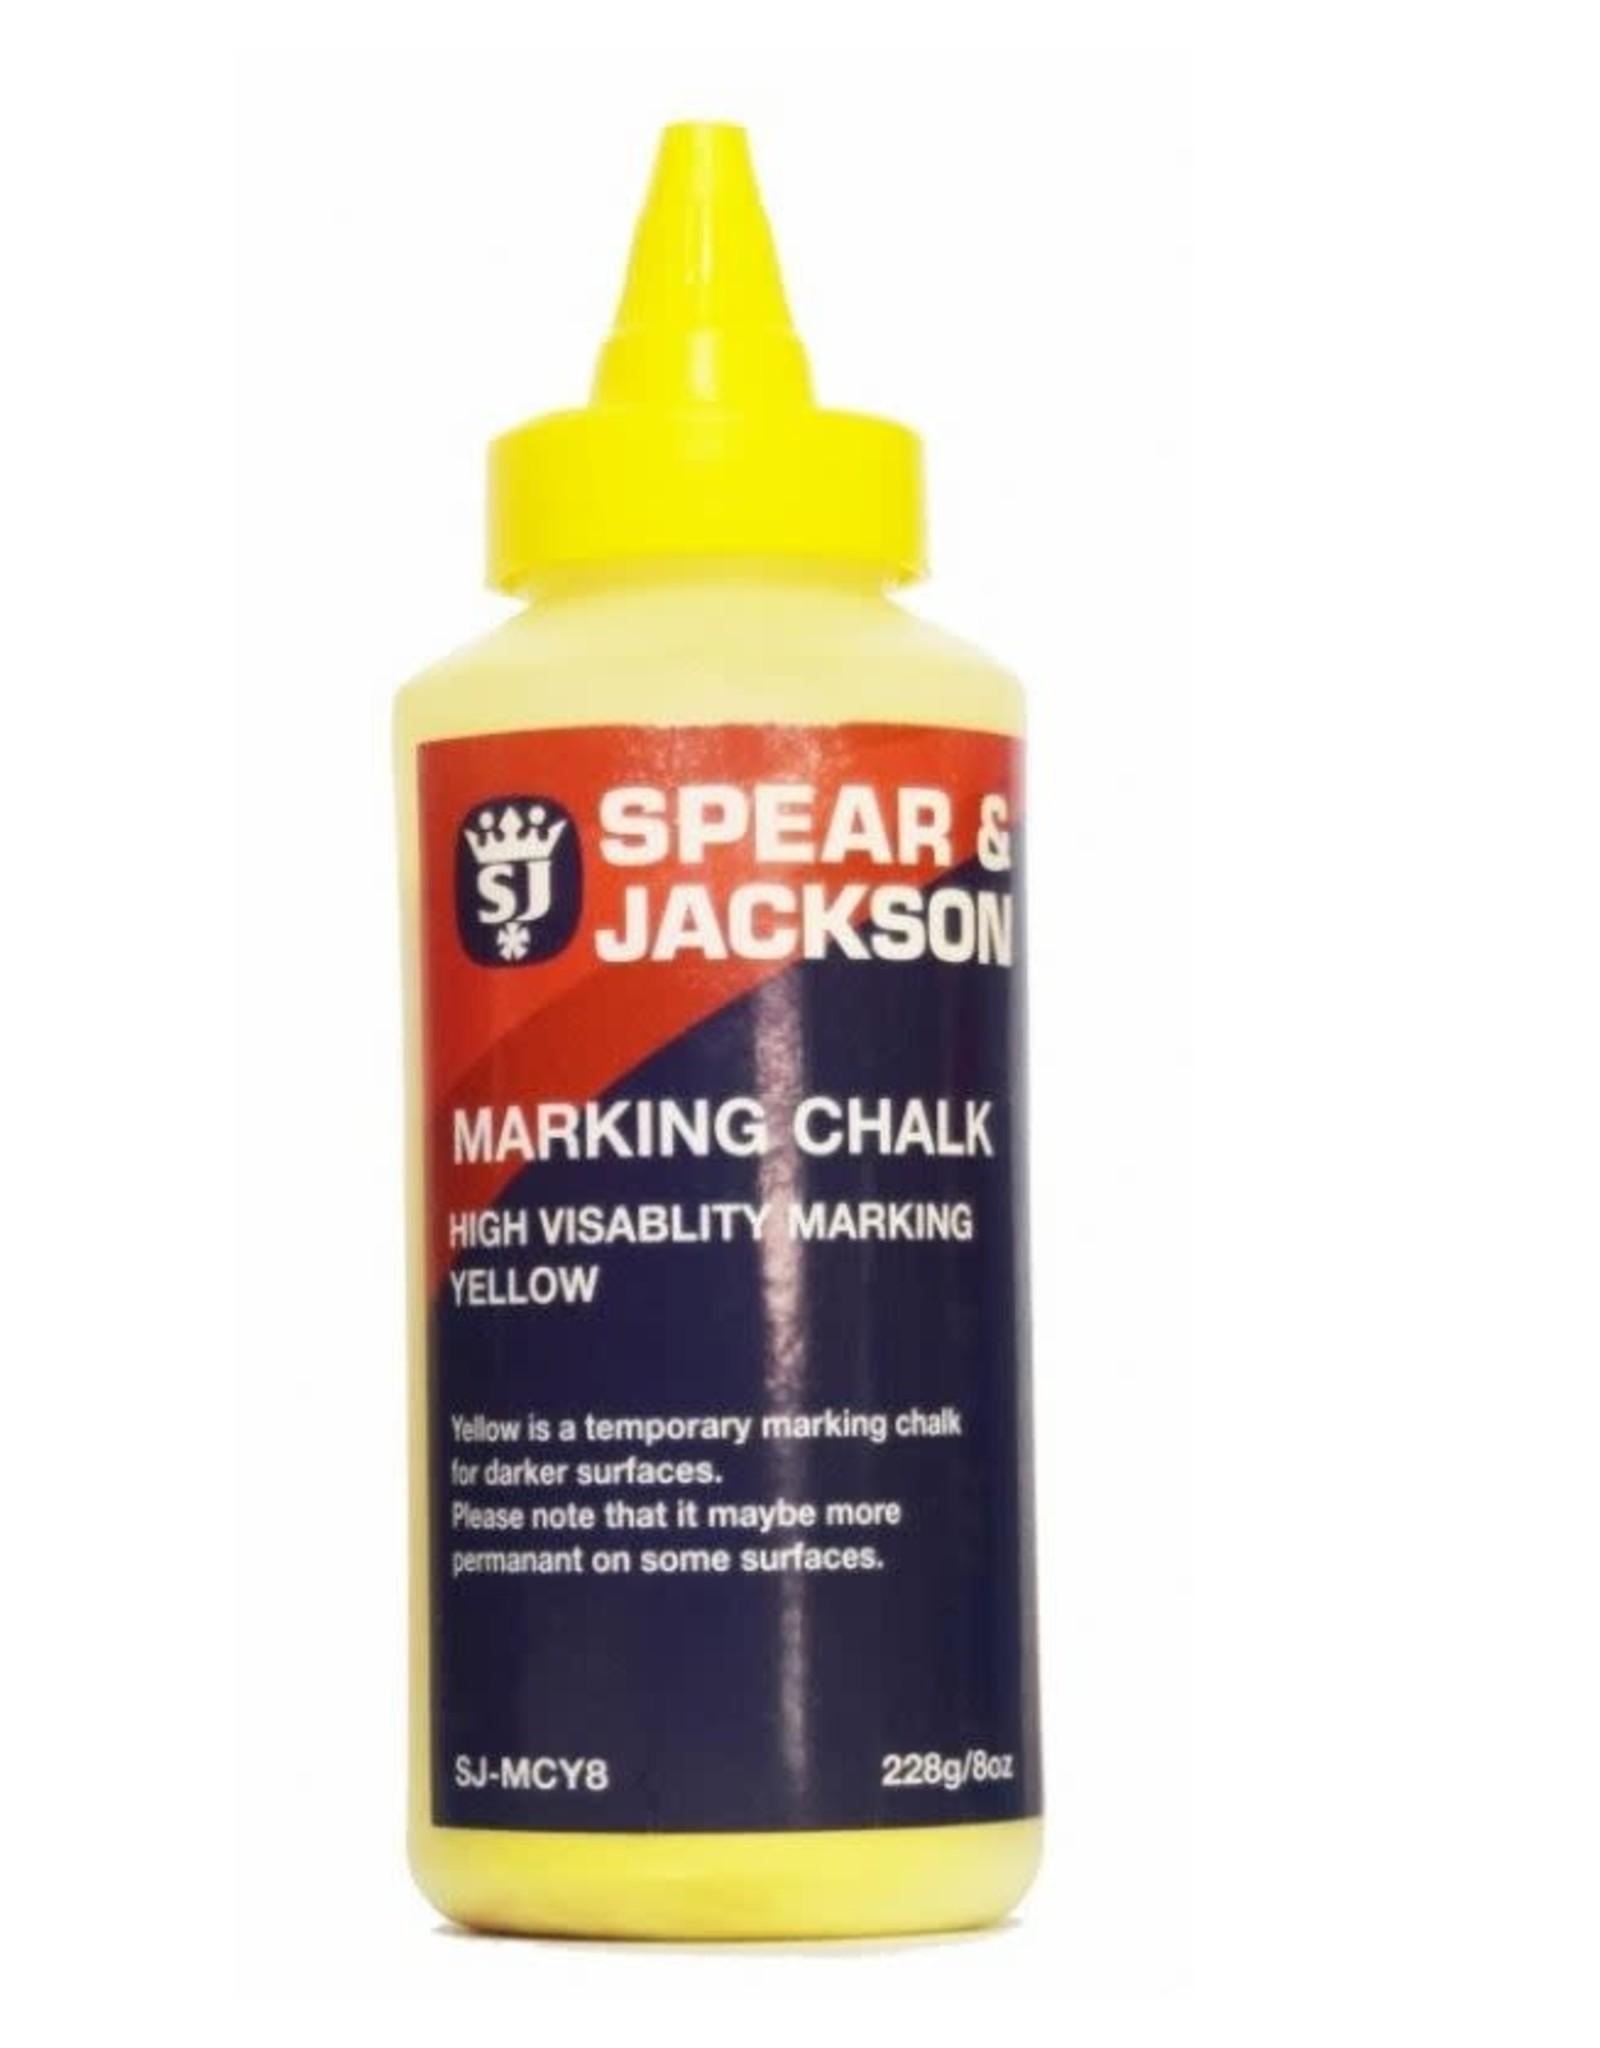 Spear & Jackson Marking Chalk